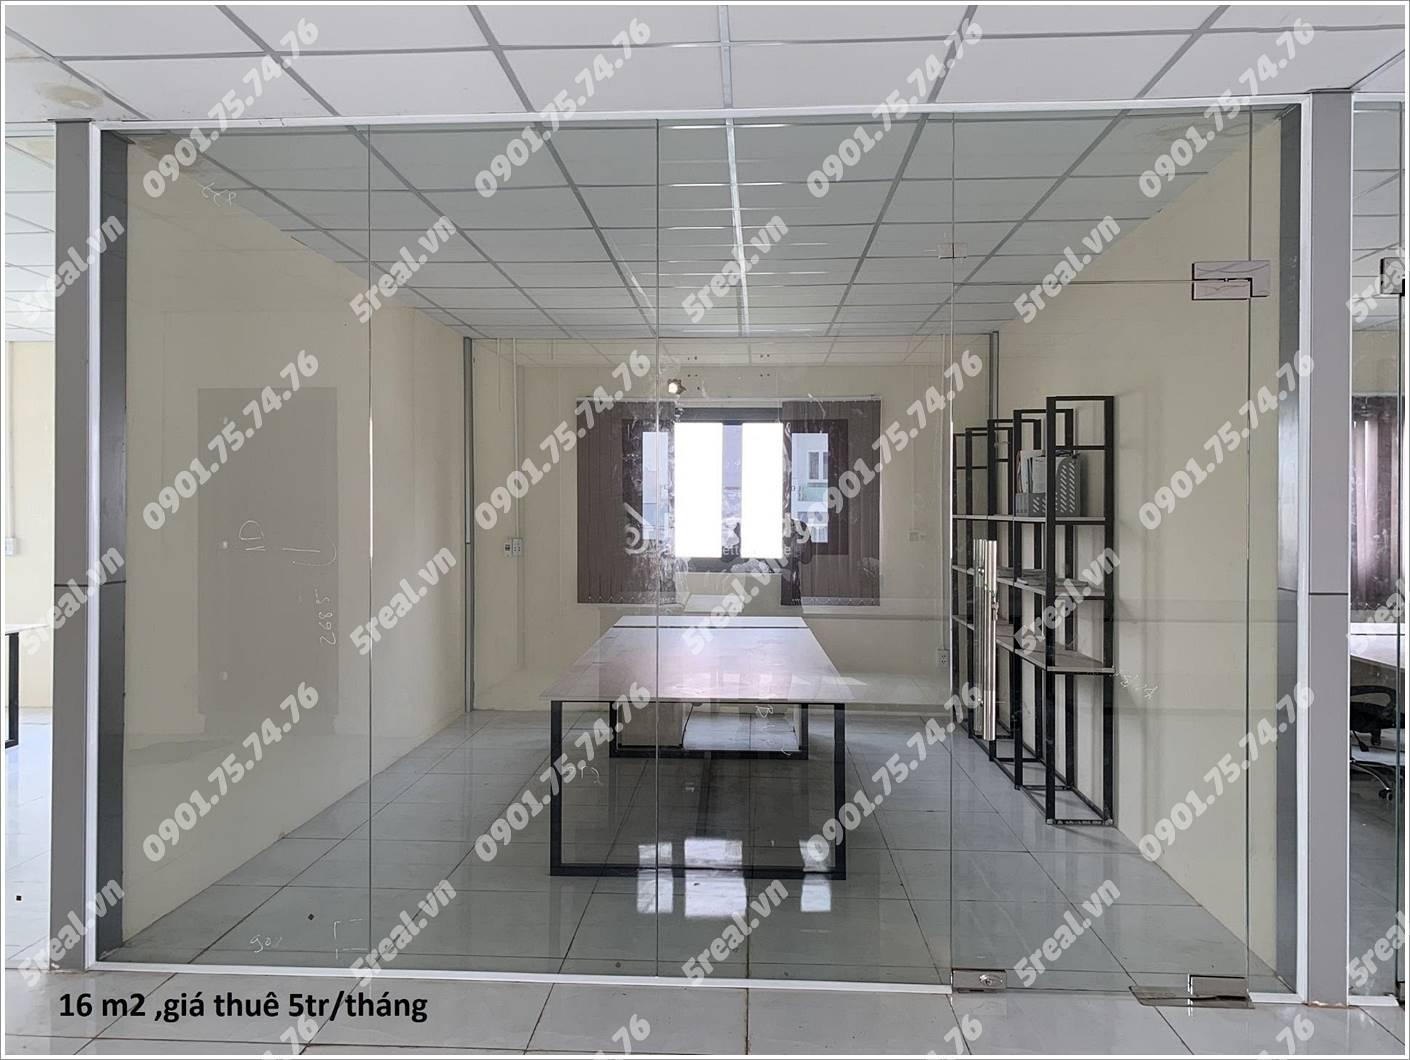 vuong-an-building-duong-so-7-quan-thu-duc-van-phong-cho-thue-tphcm-5real.vn-03